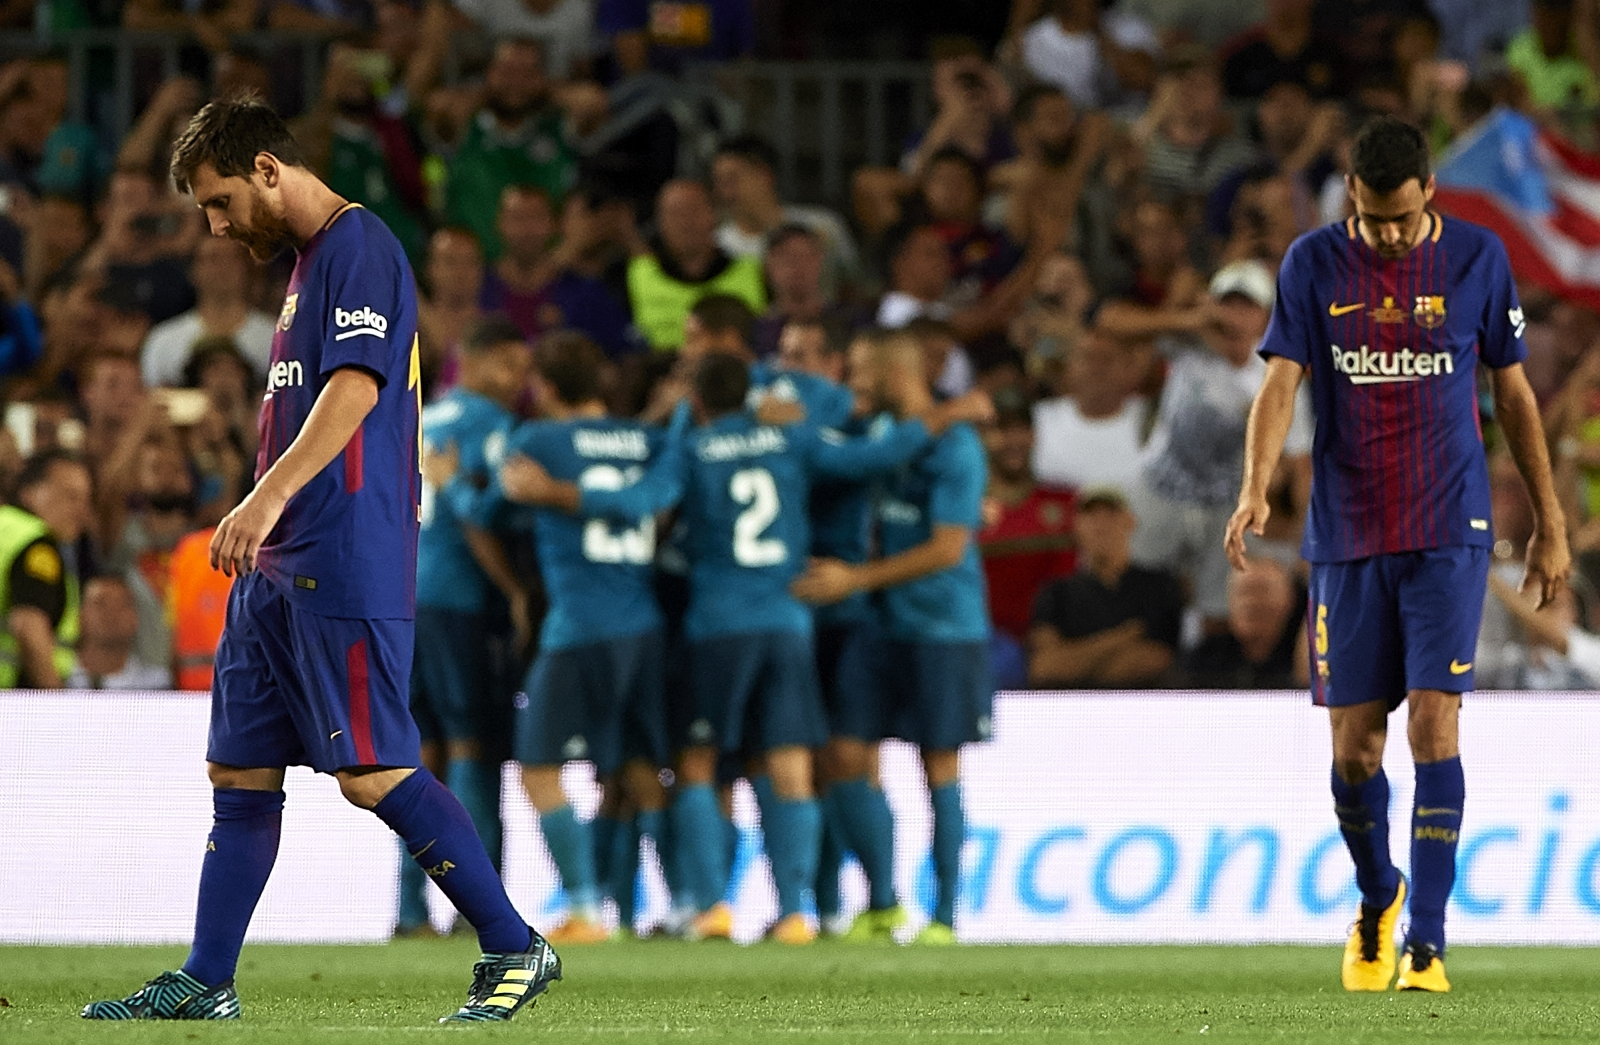 Real Madrid 1 2: Real Madrid 2-0 Barcelona: Marco Asensio And Karim Benzema